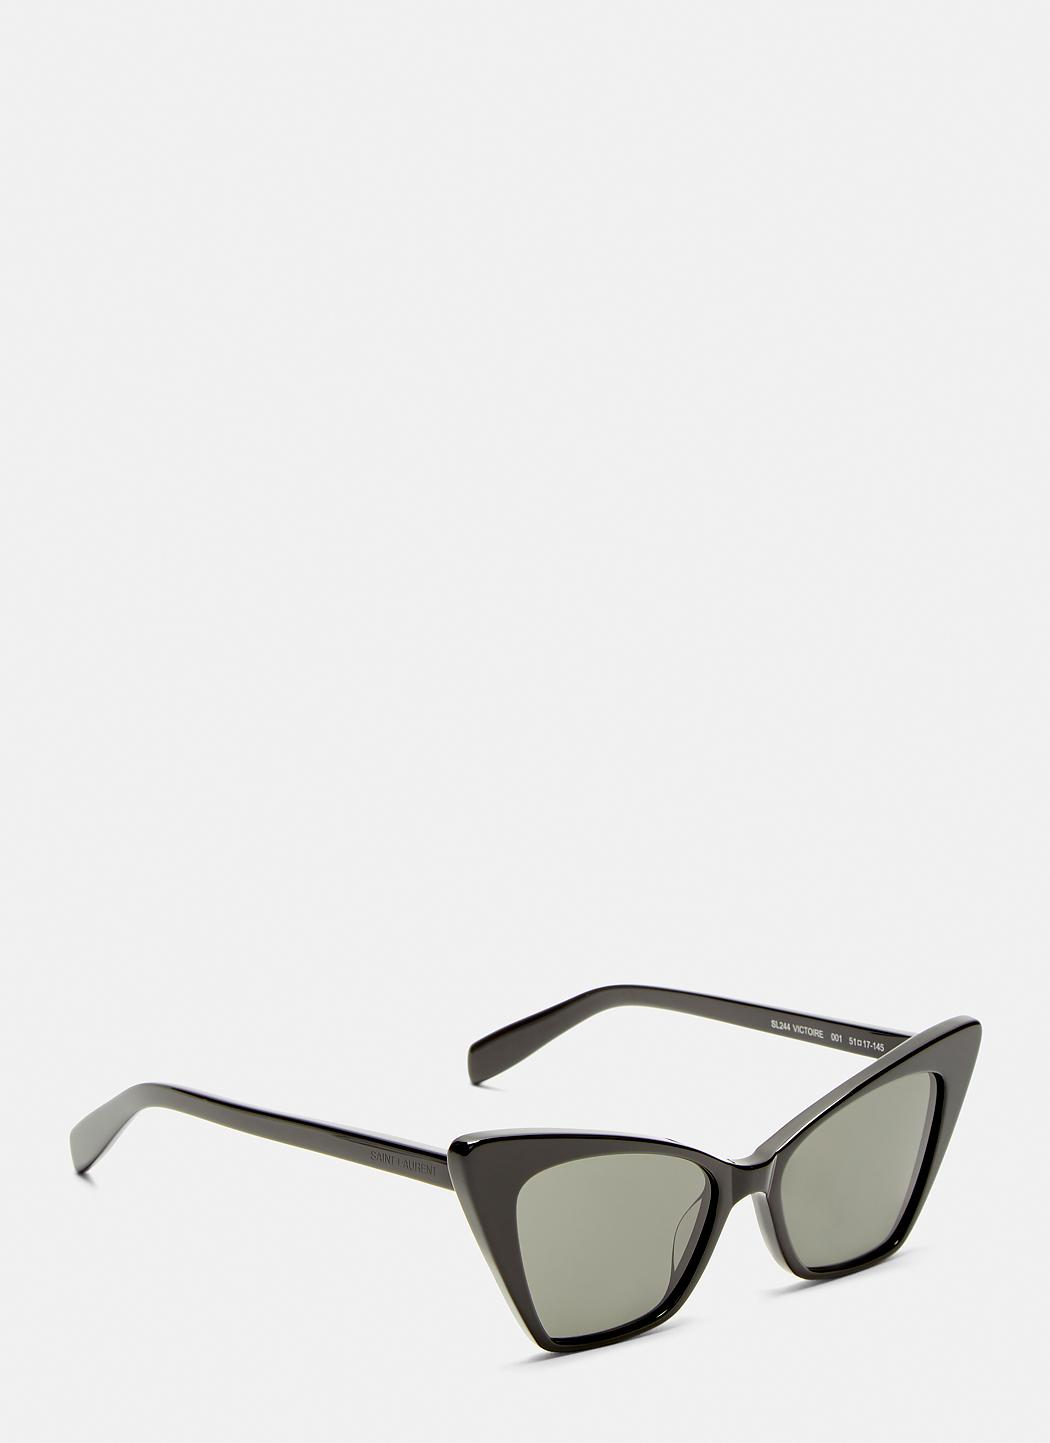 Victoire sharp cat-eye sunglasses Saint Laurent MgLyPn9